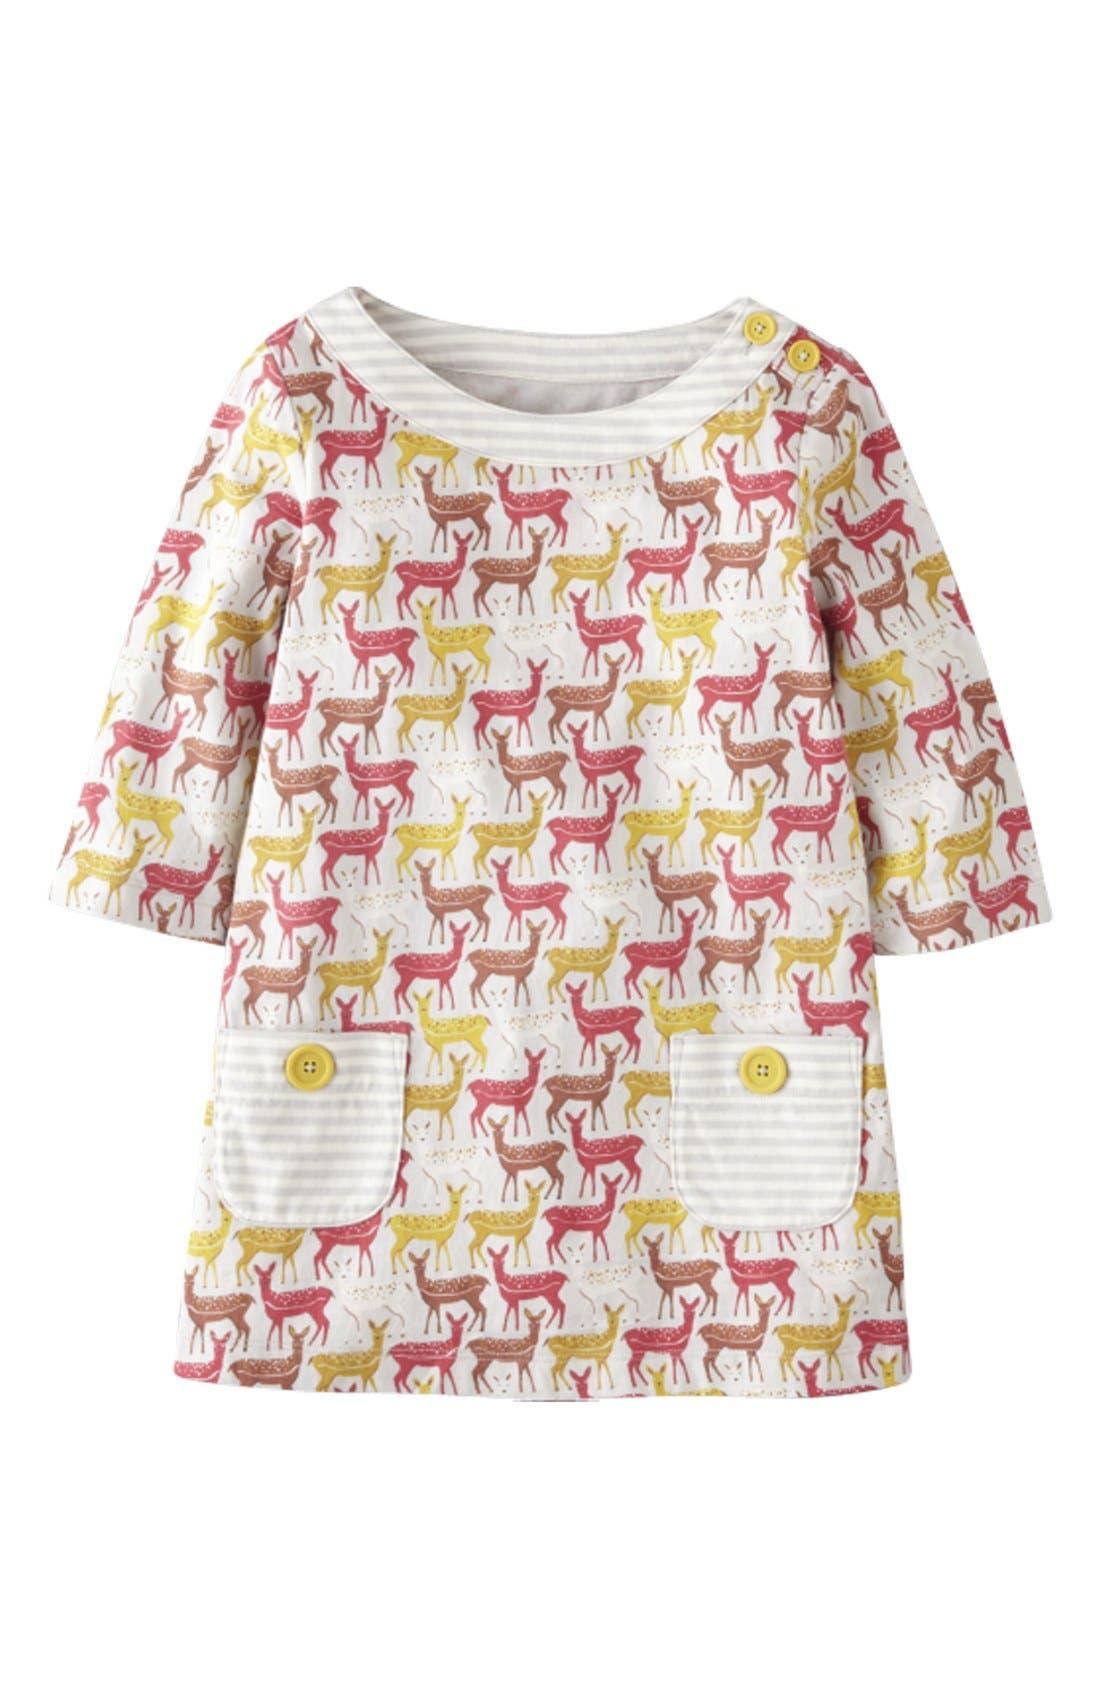 Main Image - Mini Boden Print Tunic Top (Toddler Girls)